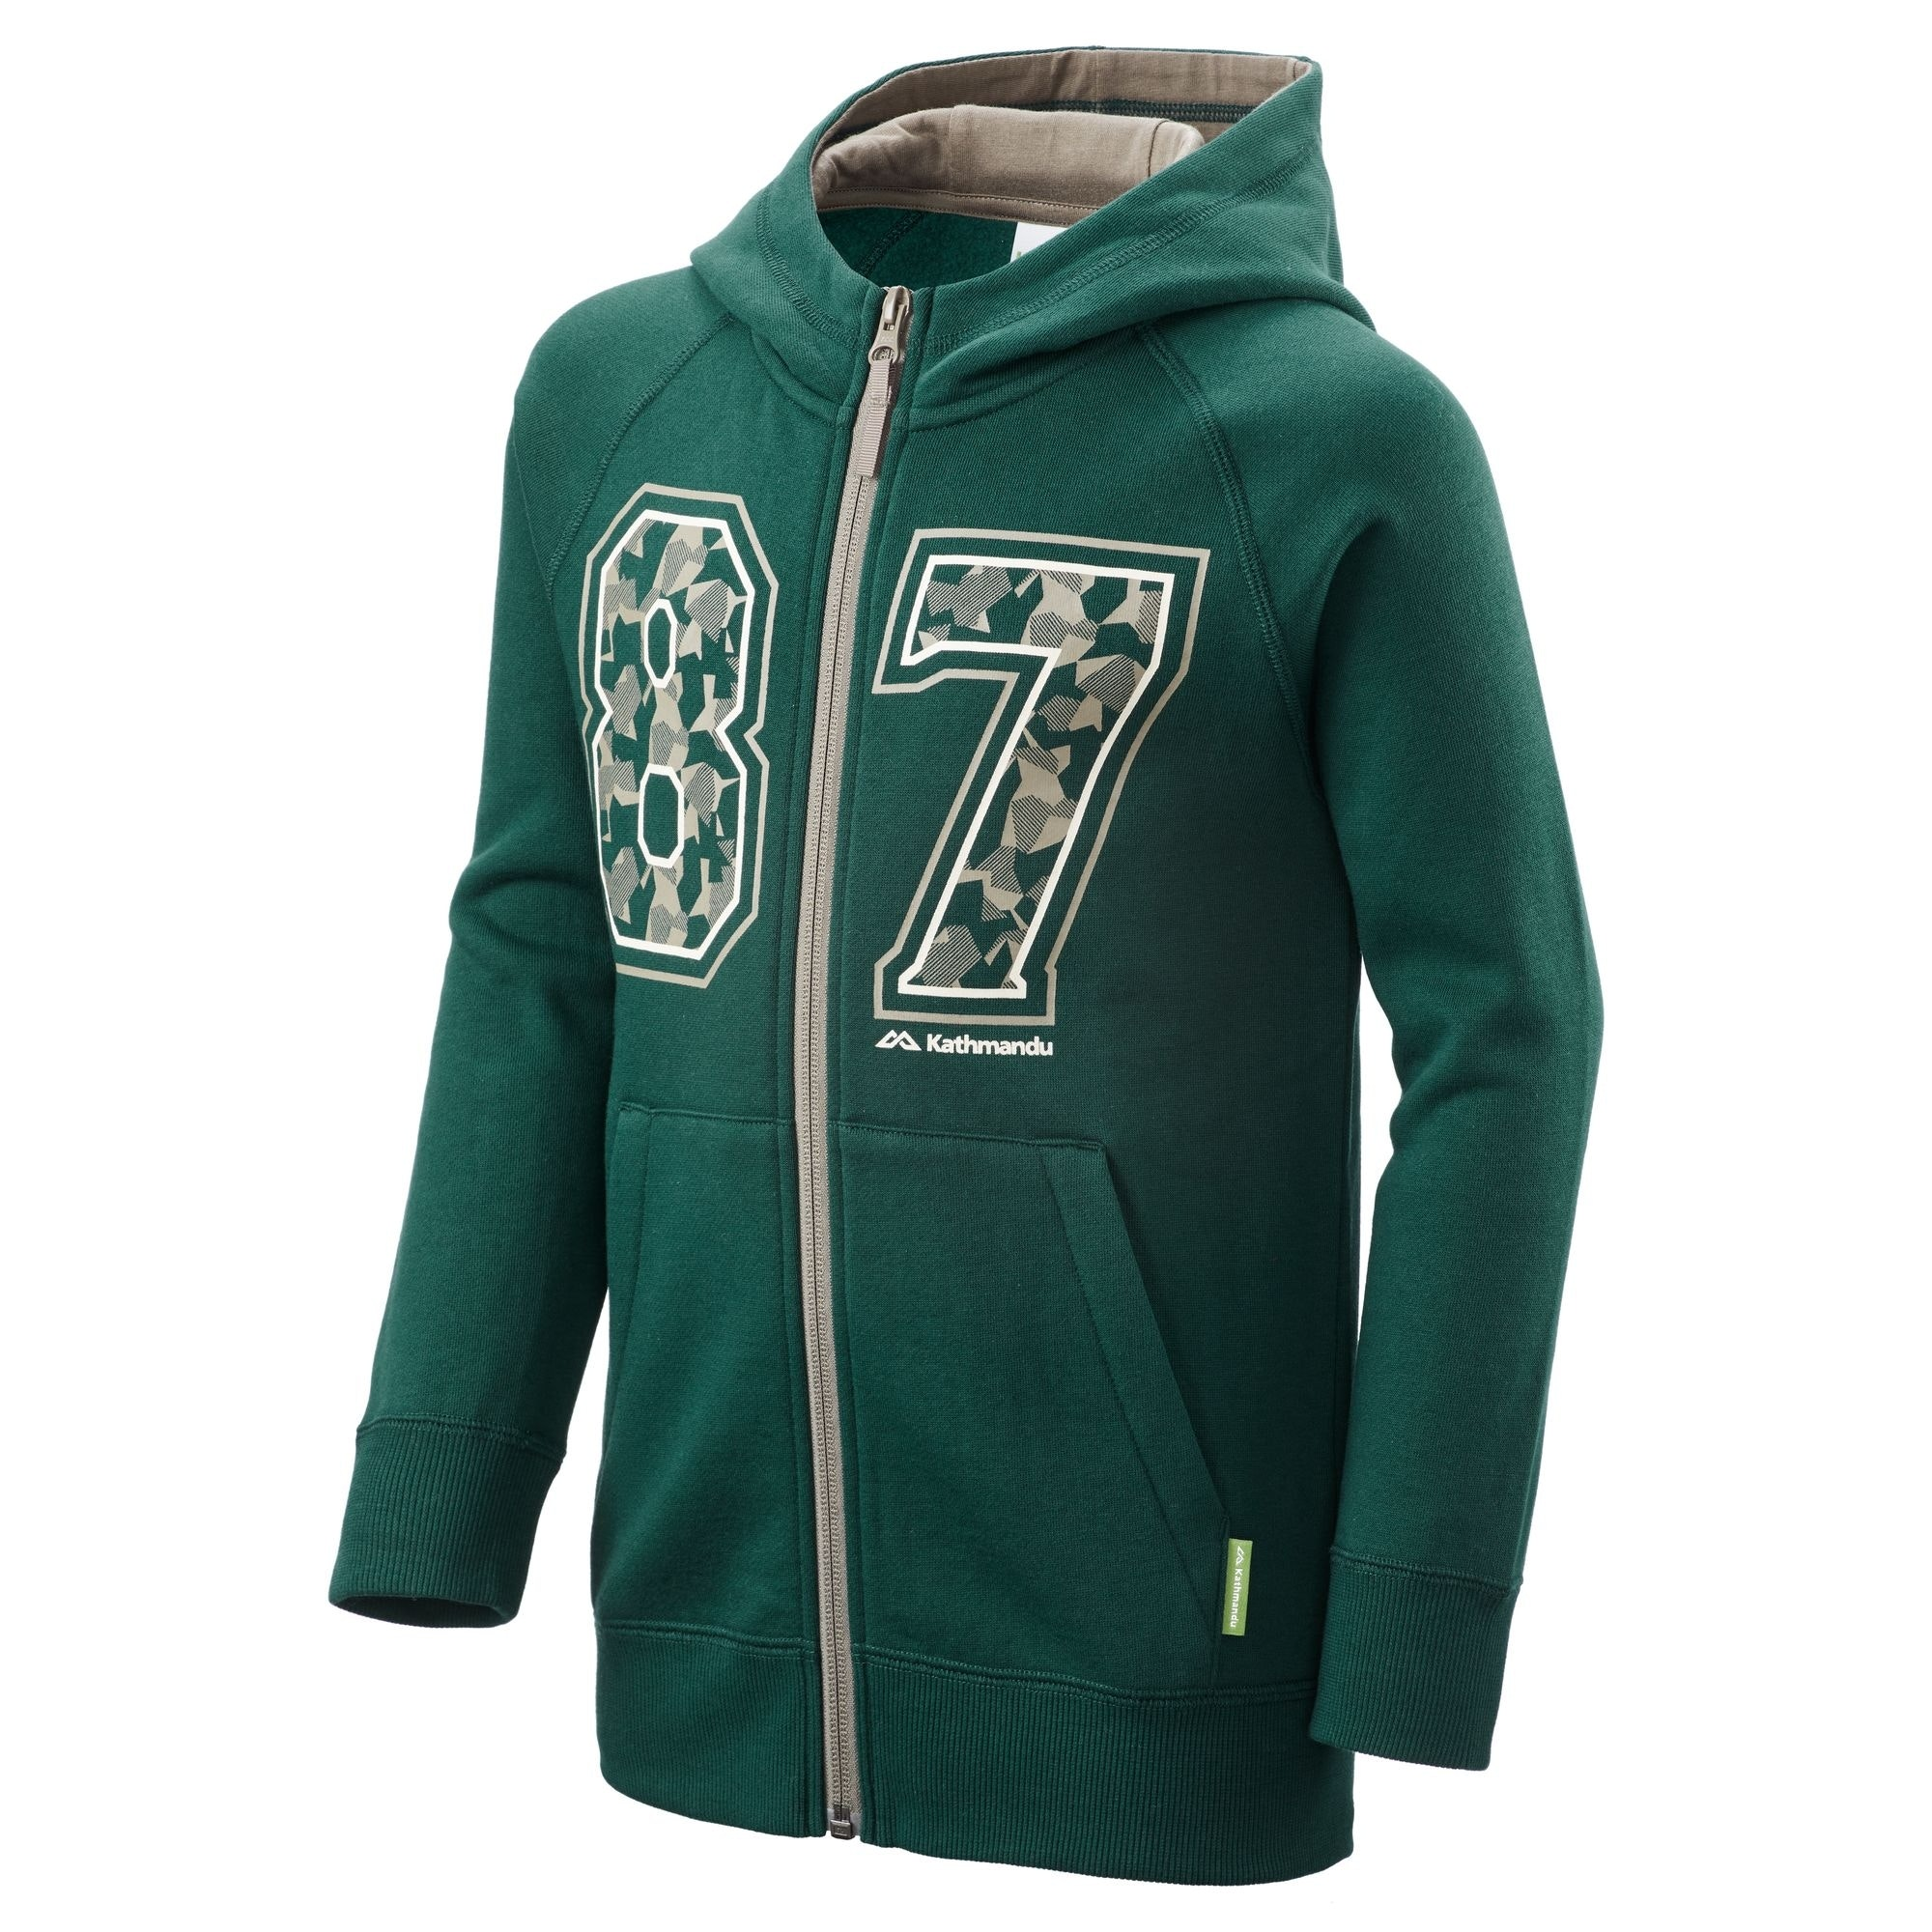 NEW-Kathmandu-Youth-Boy-039-s-Girl-039-s-Full-Zip-Hooded-Winter-Warm-Fleece-Jacket thumbnail 8